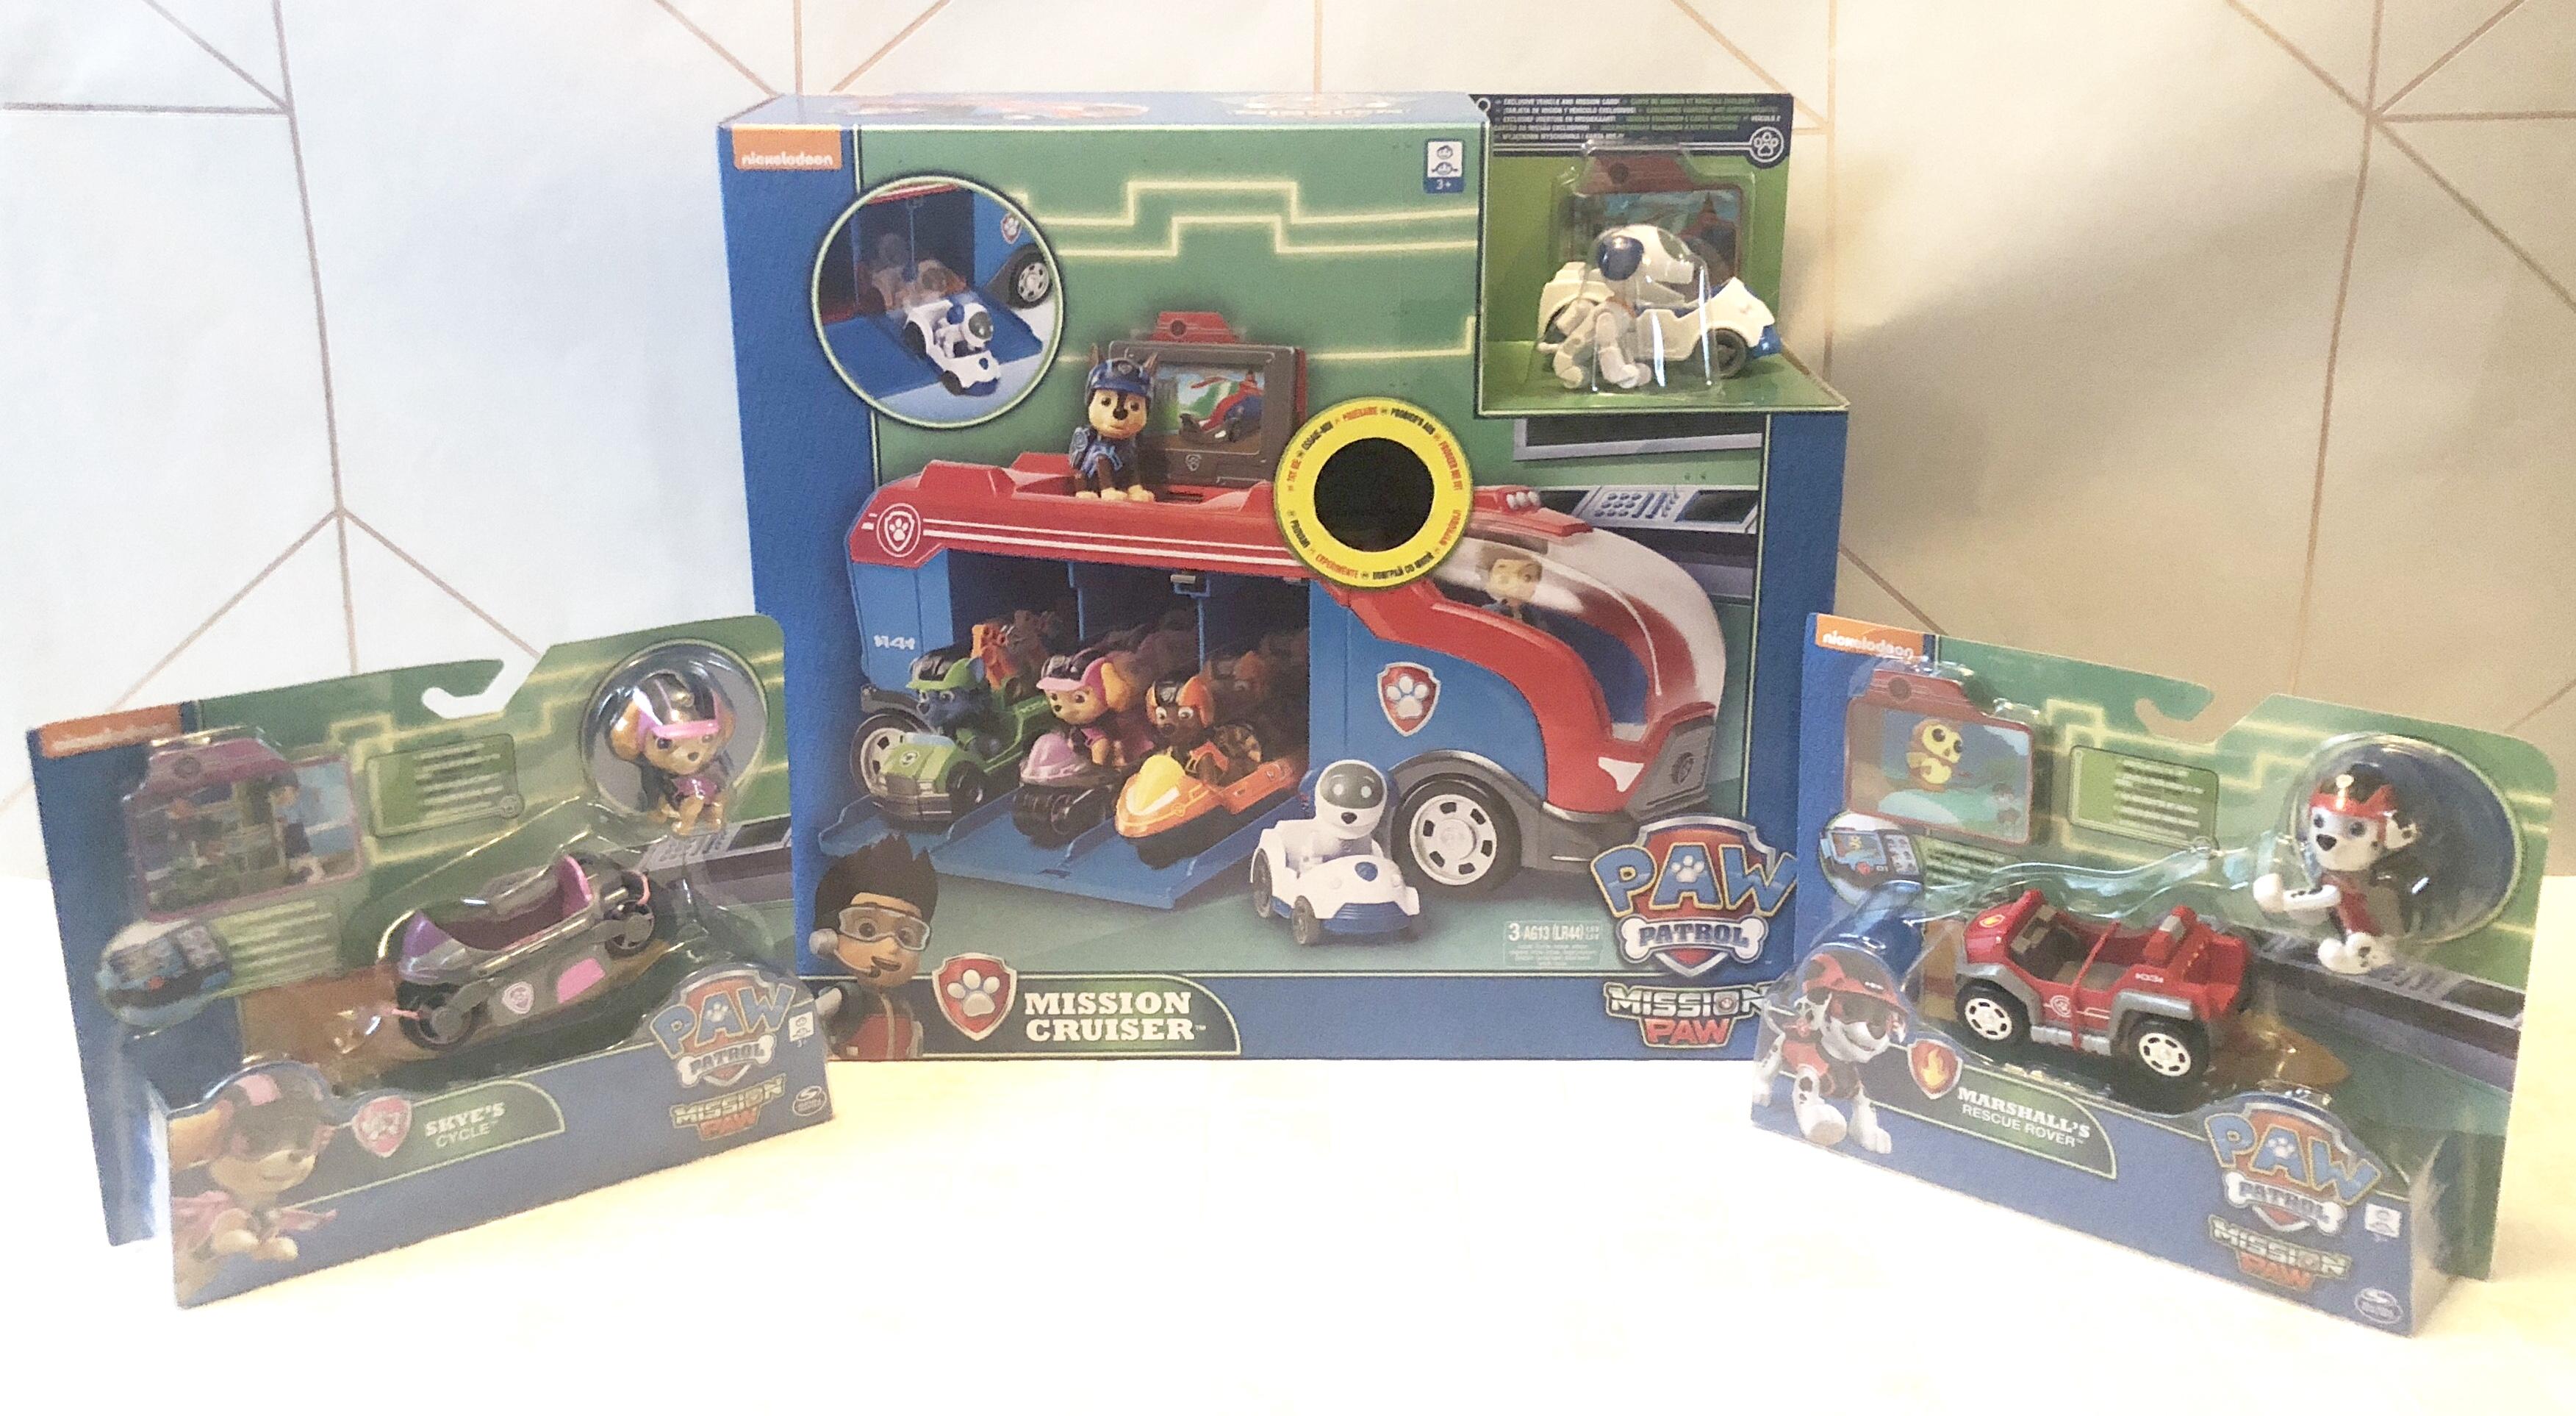 Paw Patrol Cruiser Chase Vehicle Mission Car Truck Robo Dog Mini Vehicles Set